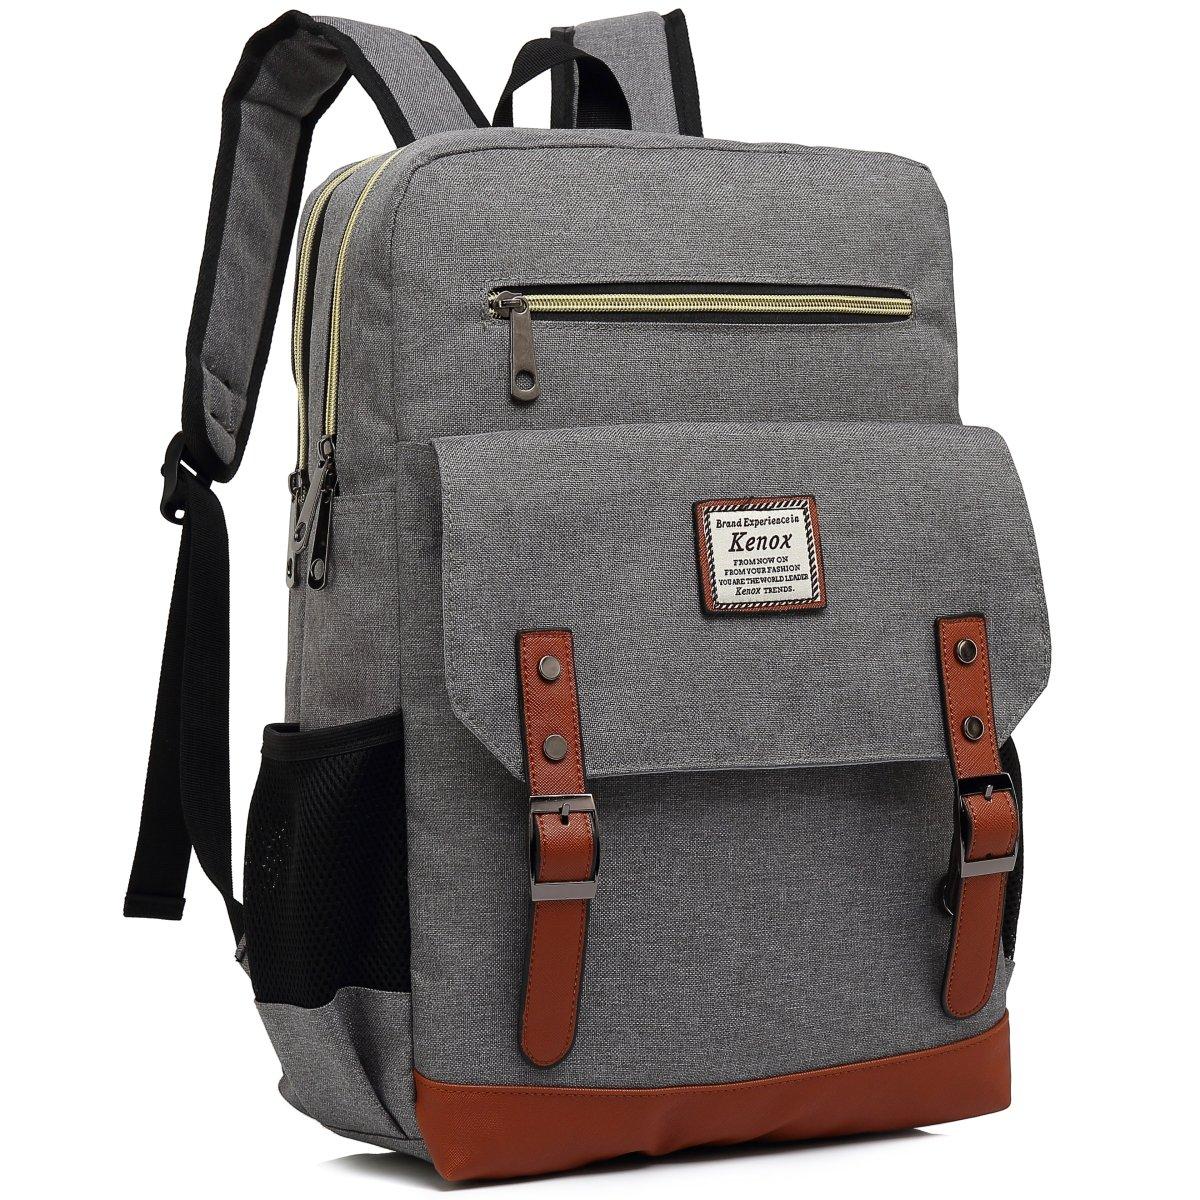 Kenox Mens Large Vintage Canvas Backpack School Laptop Bag Hiking Travel Rucksack (Greyfabric)